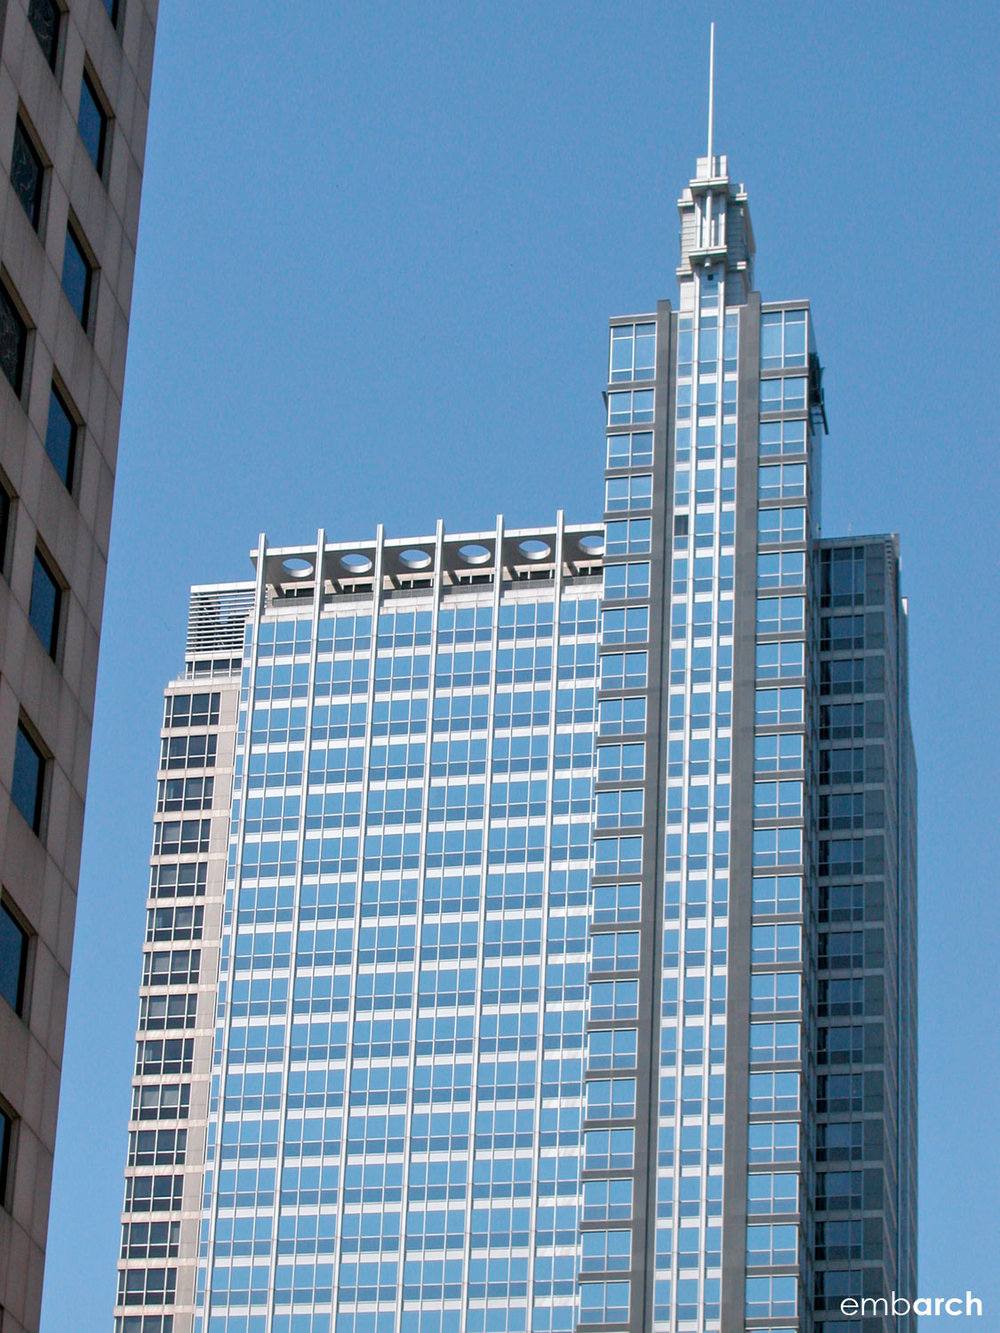 Boeing Building - exterior